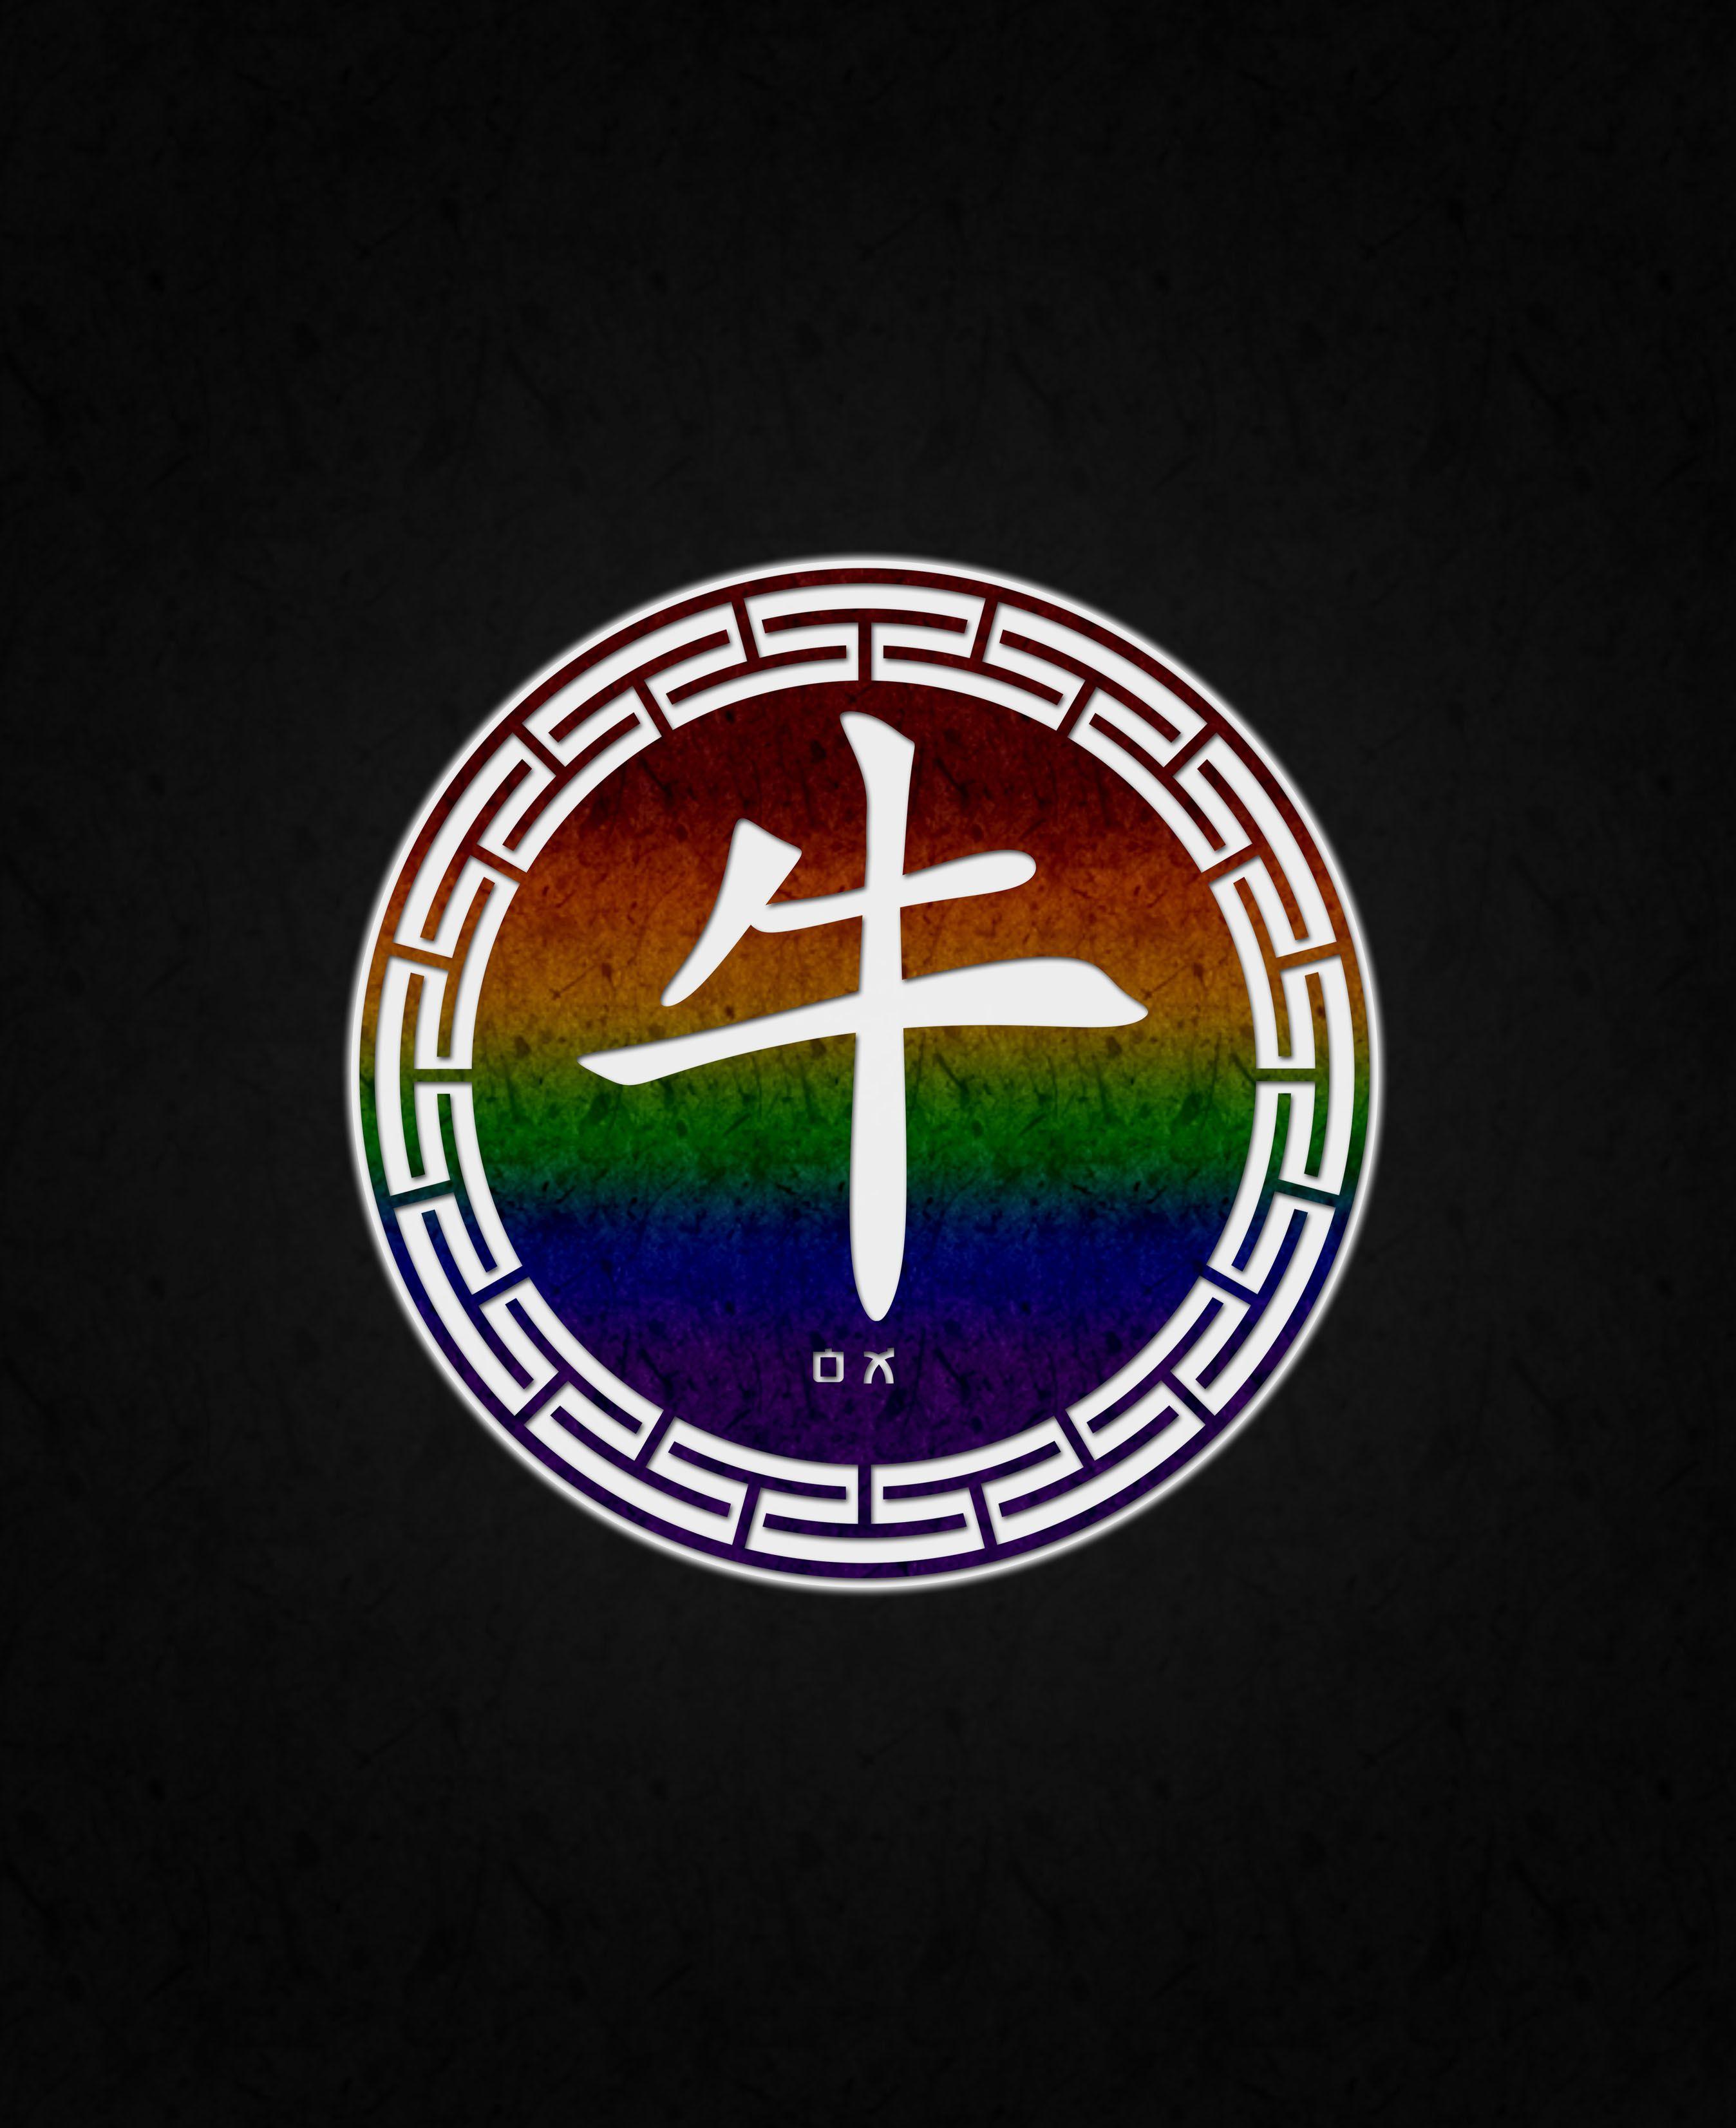 Lgbt pride chinese horoscope ox symbol in rainbow colors lgbt pride chinese horoscope ox symbol in rainbow colors gaypride chinesehoroscopeox liveloudgraphics buycottarizona